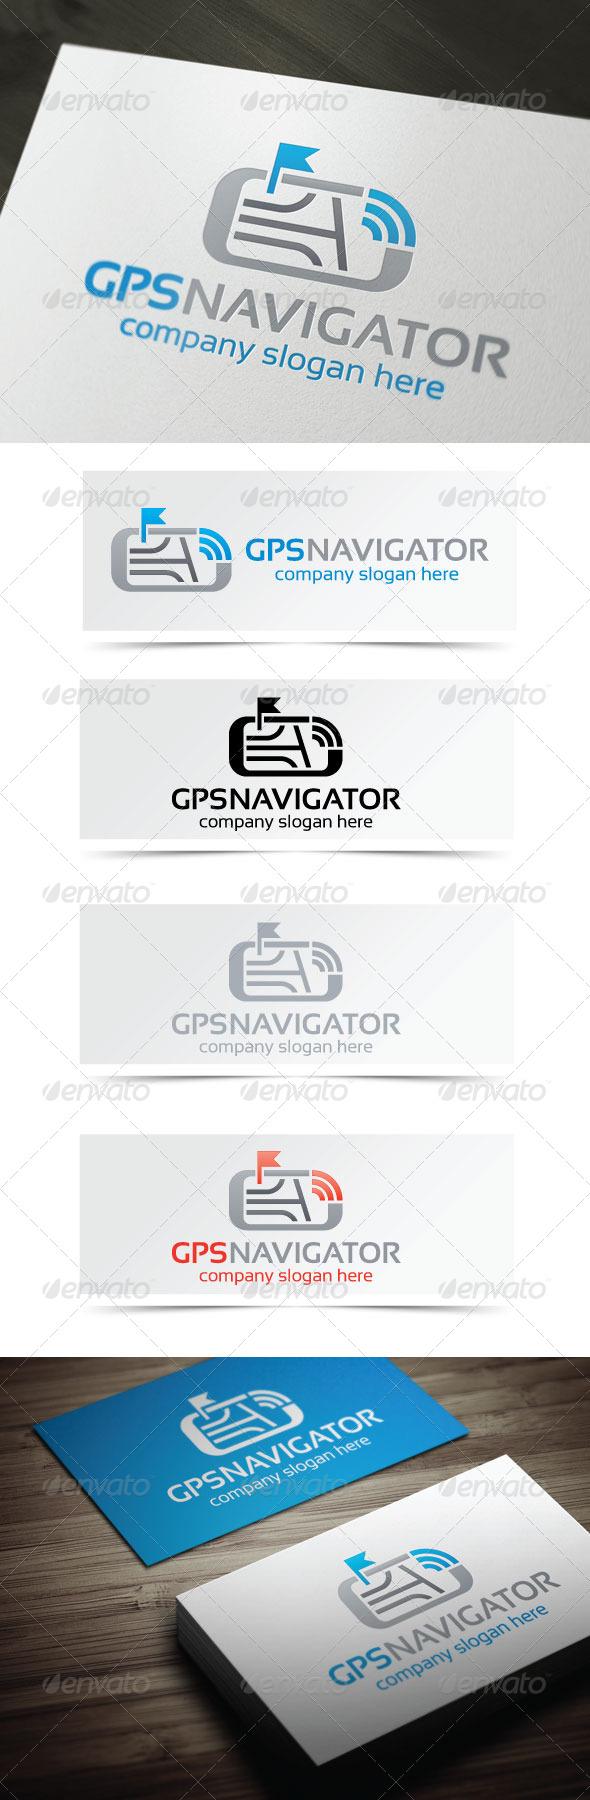 GPS Navigator - Objects Logo Templates